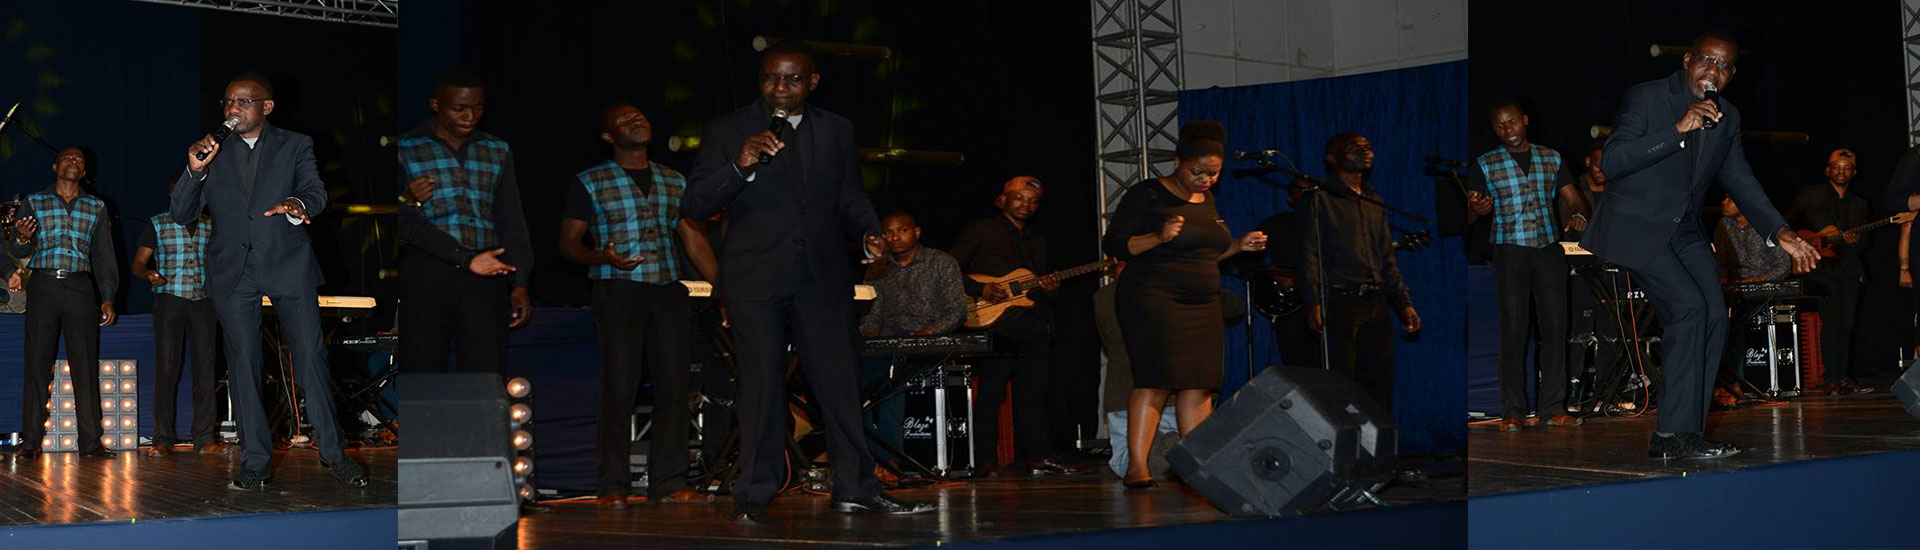 Pastor Ndamba ministering